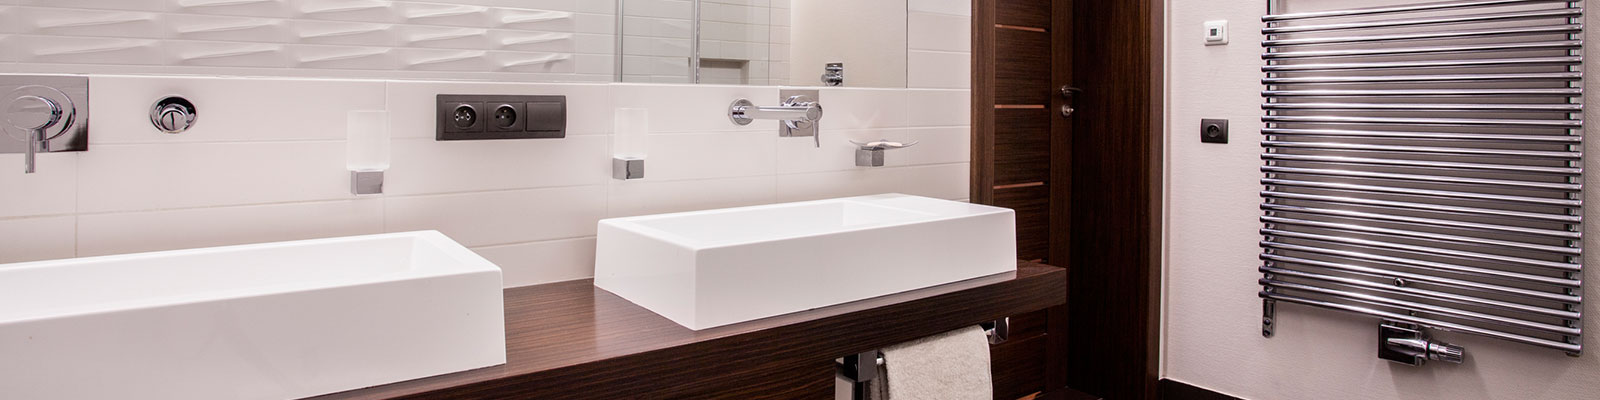 Bathroom & Kitchen Refurbishment